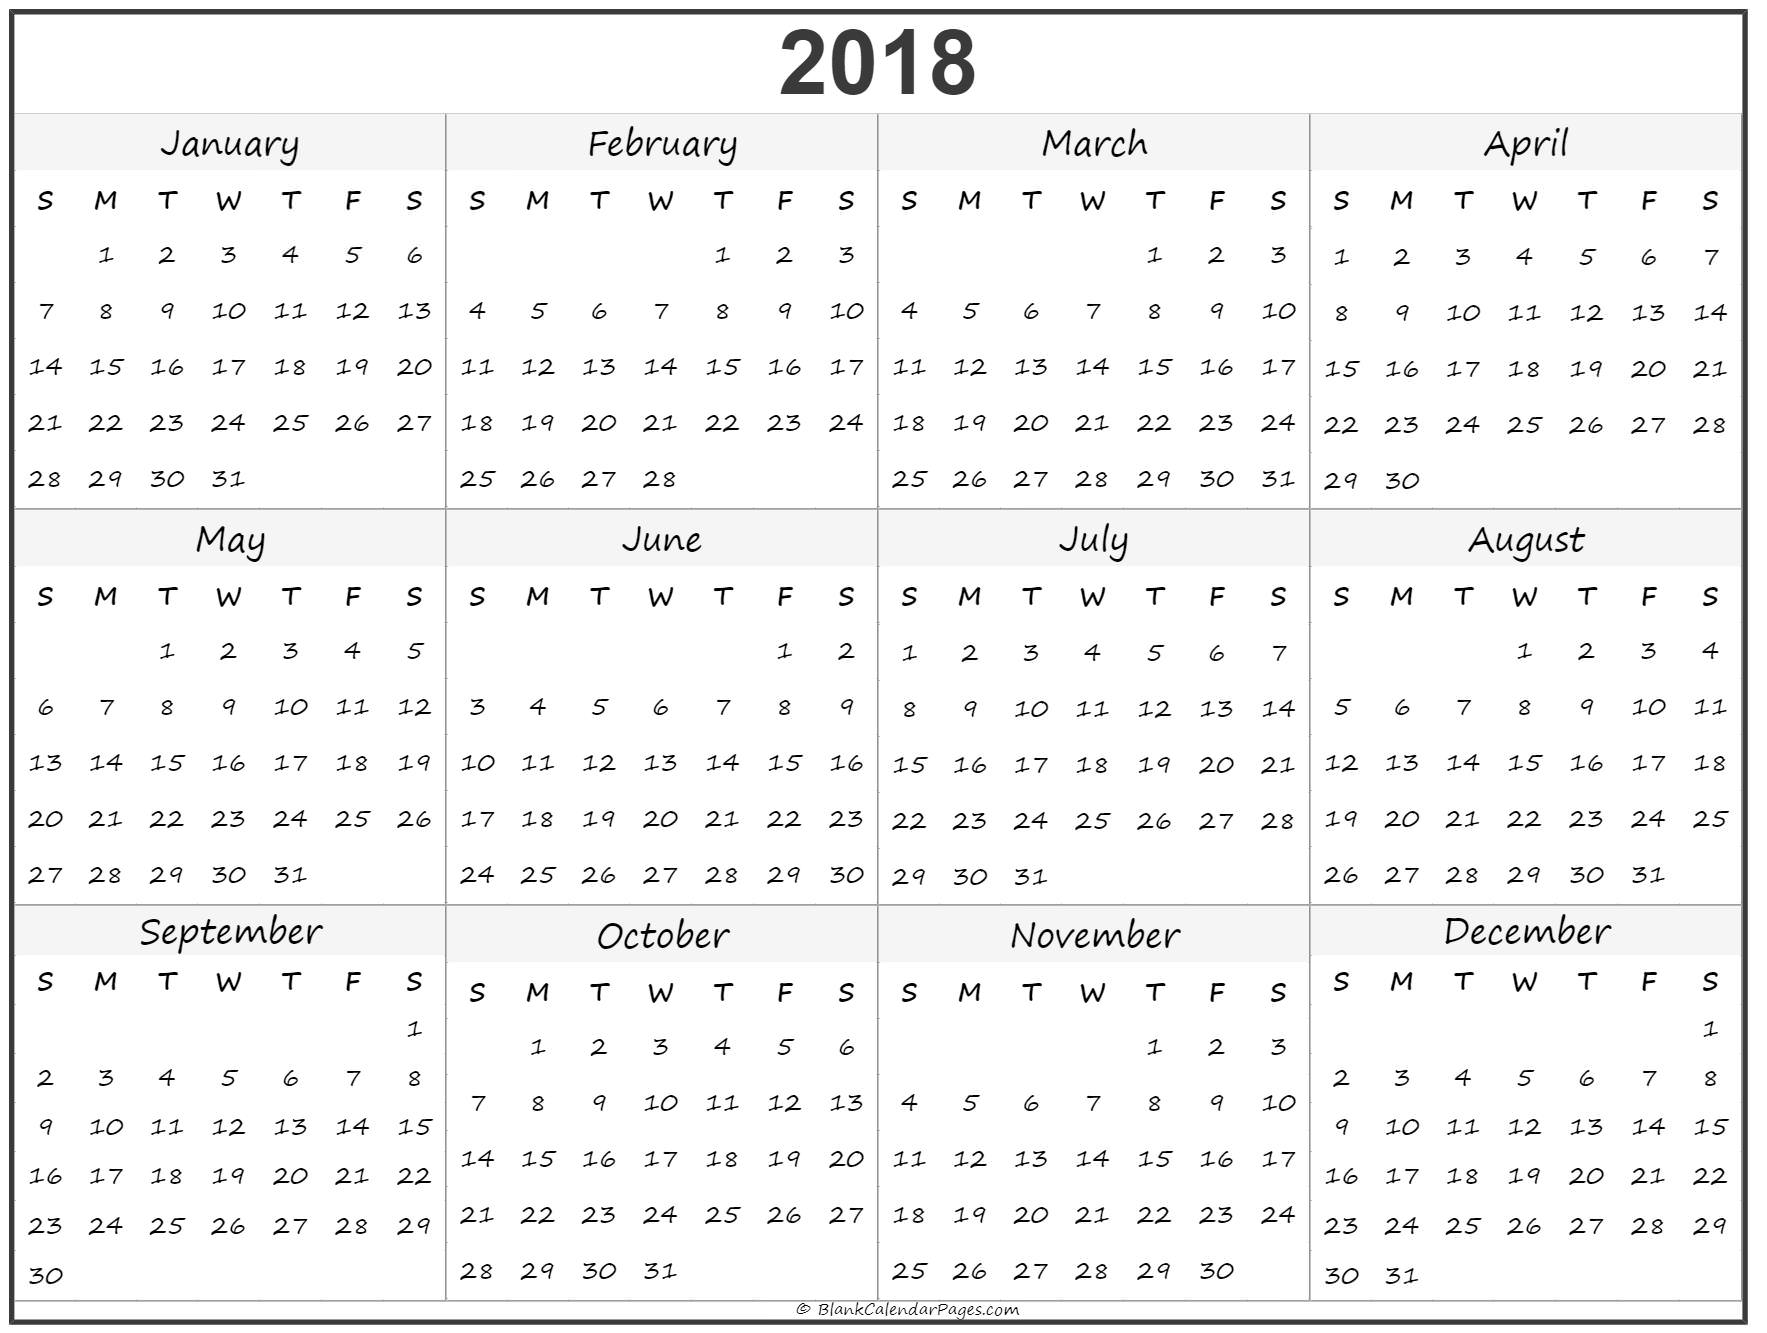 Yearly calendar 2018